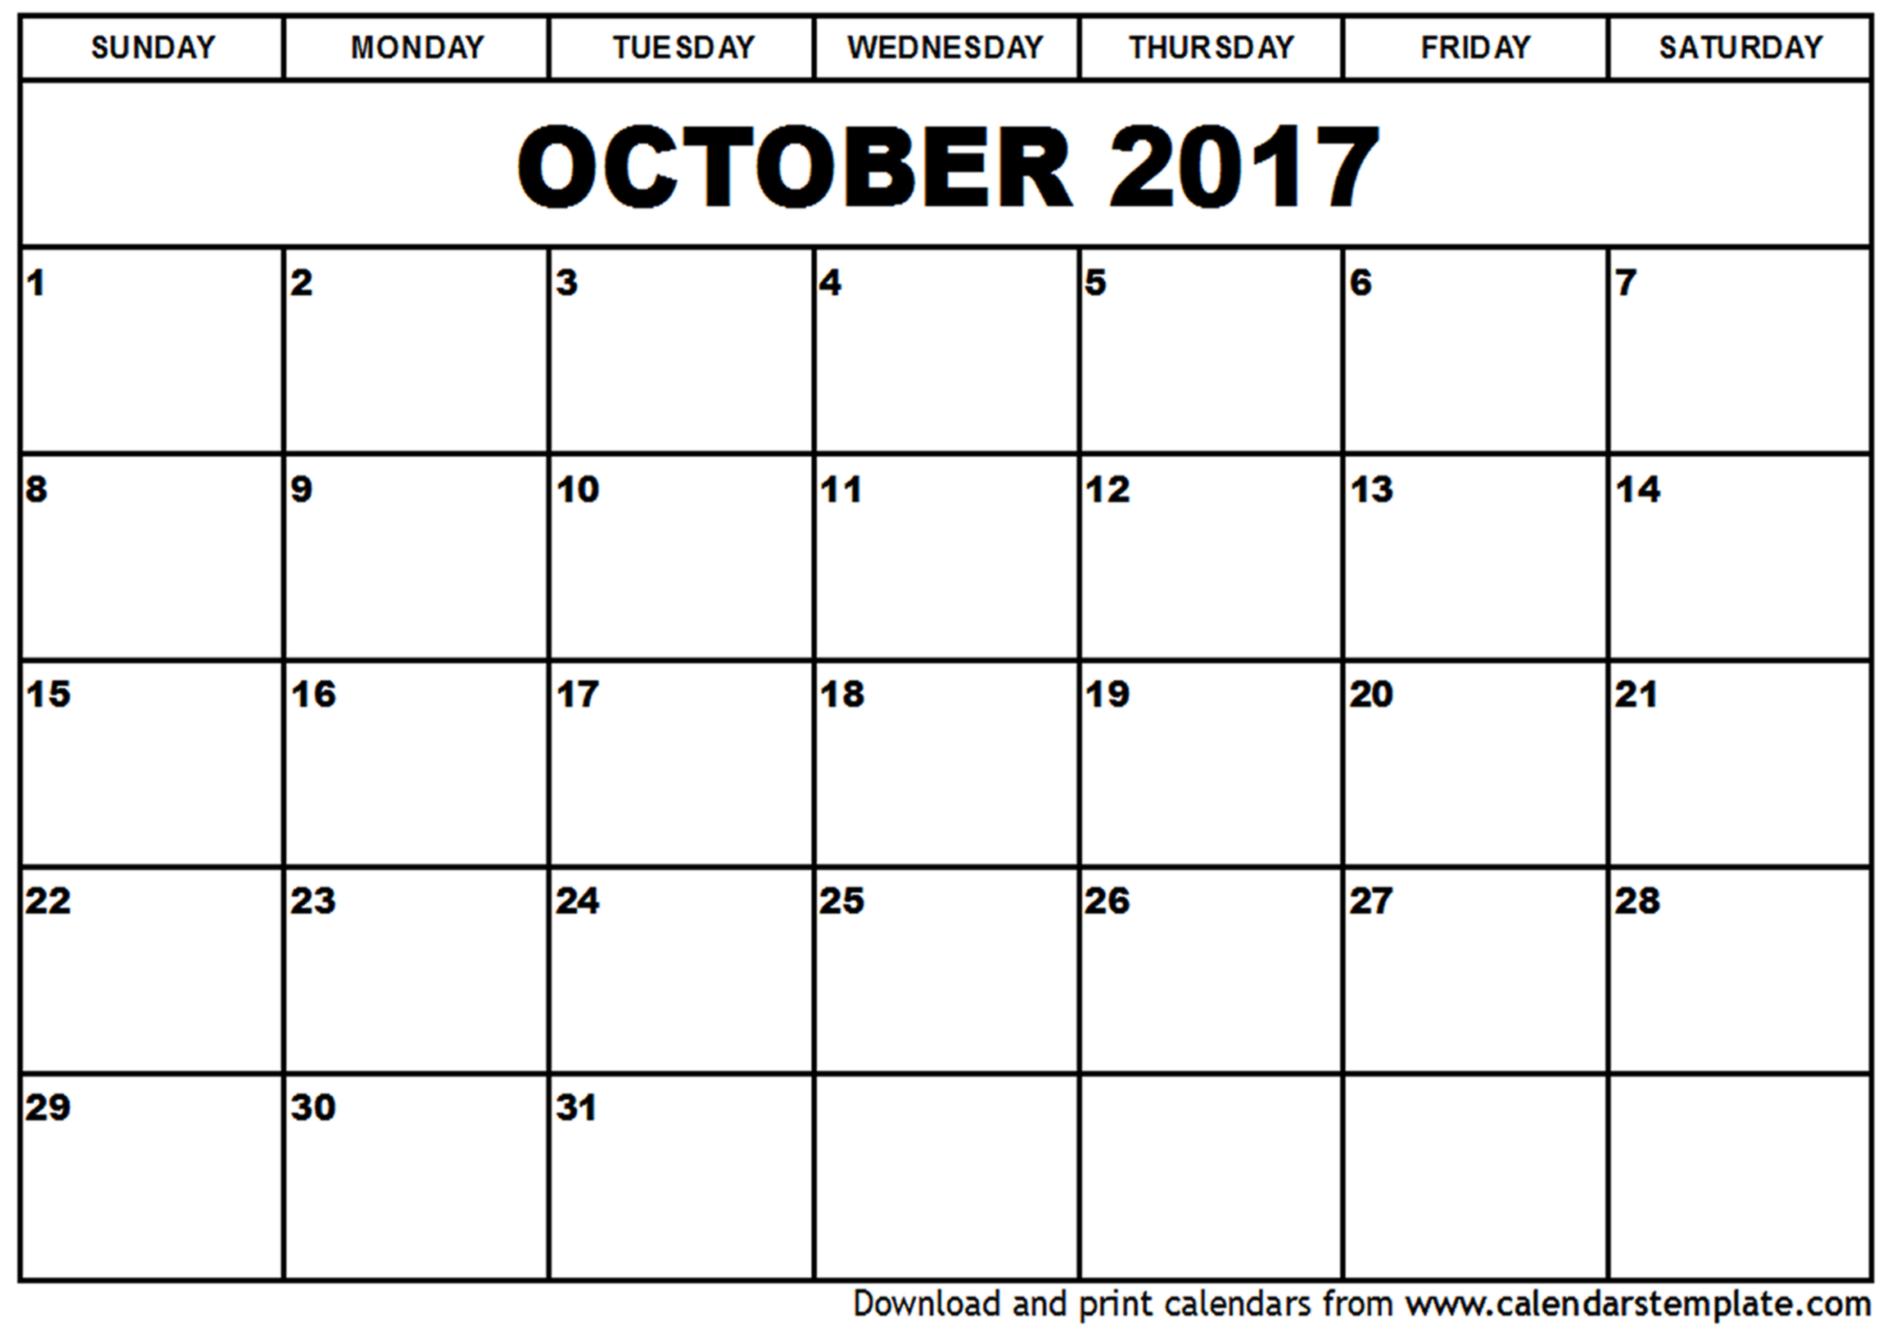 October 2017 Calendar With Holidays Uk | yearly calendar printable